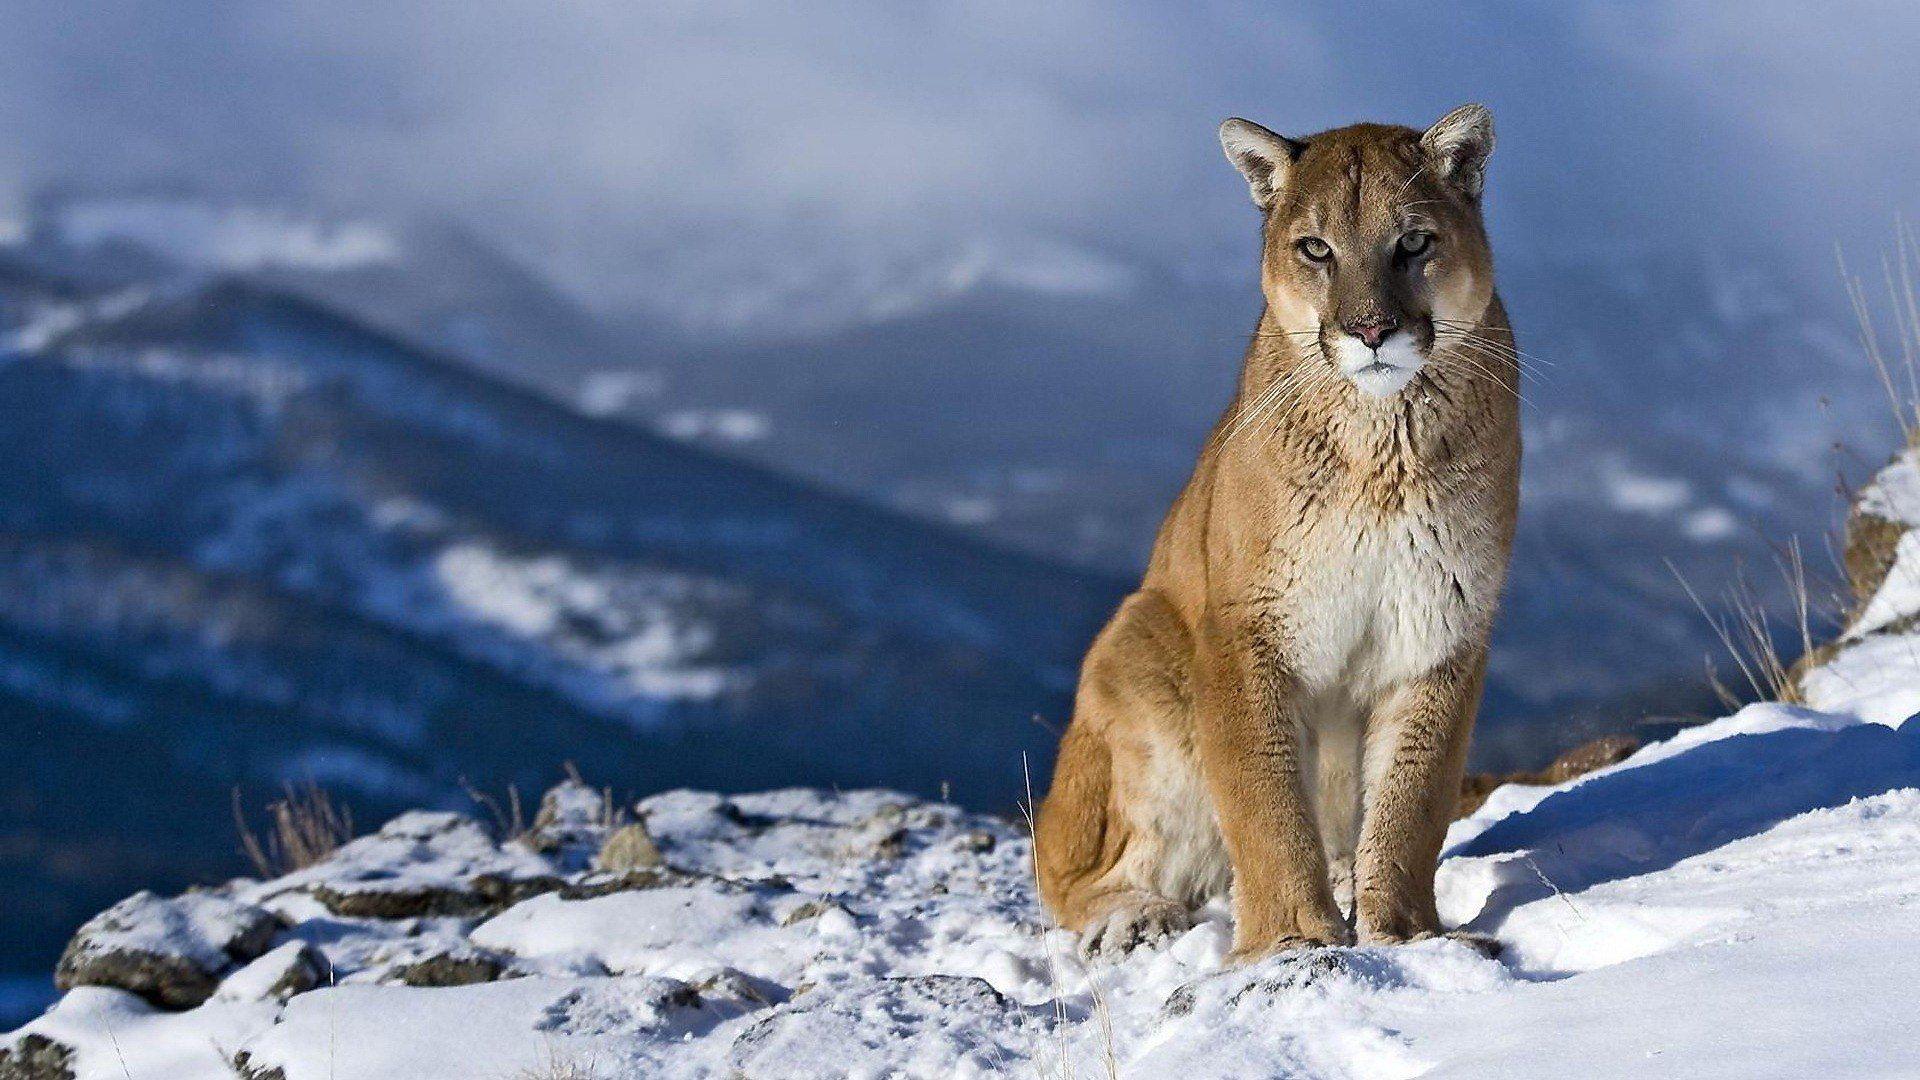 Cougar Hd desktop wallpaper